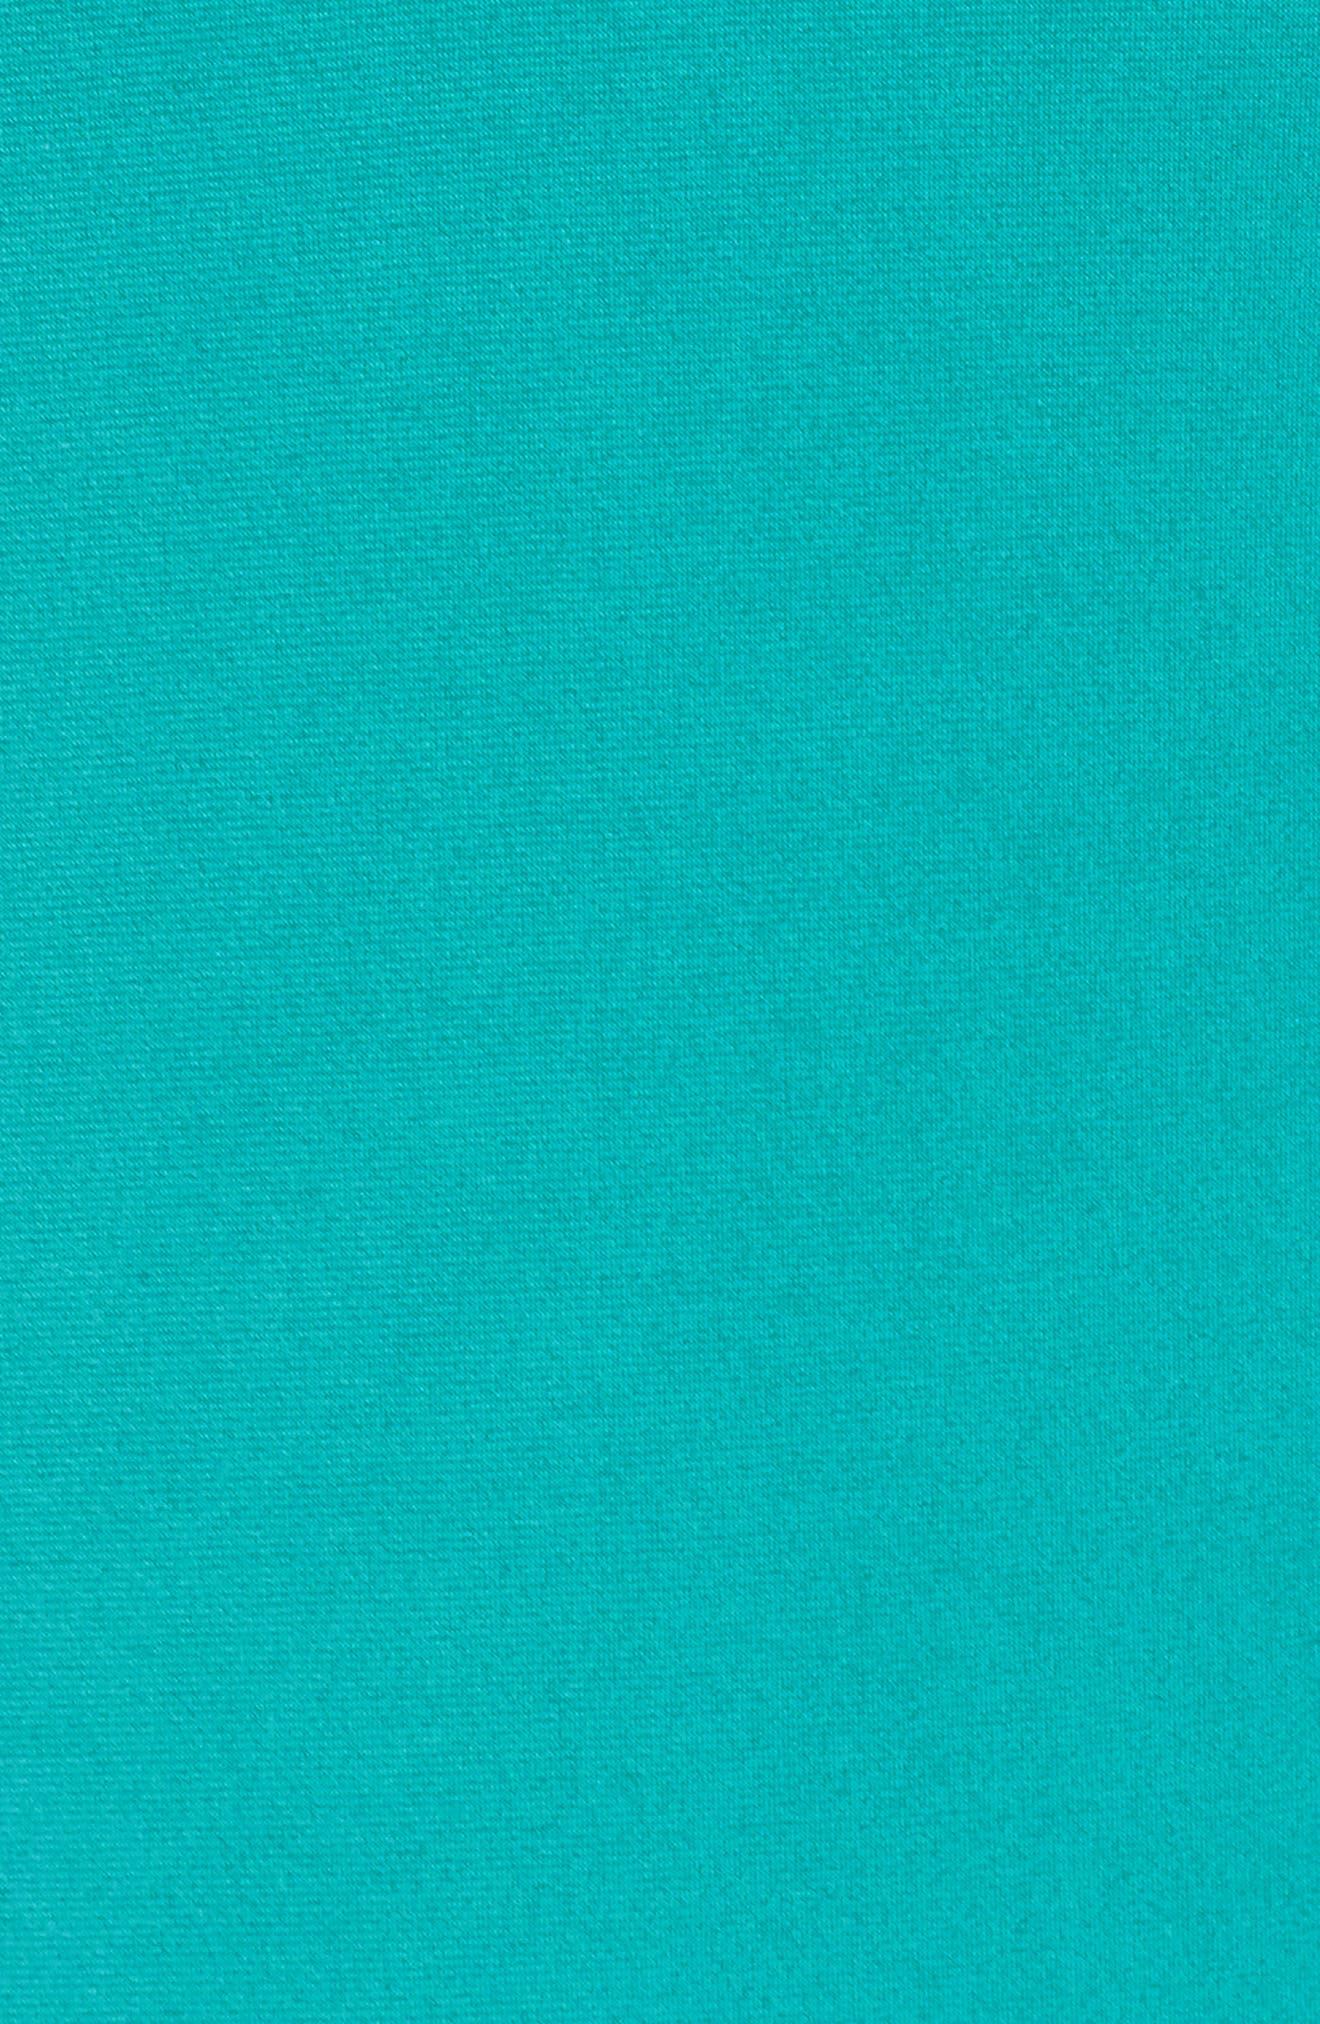 Ring Detail Shift Dress,                             Alternate thumbnail 5, color,                             Tile Blue